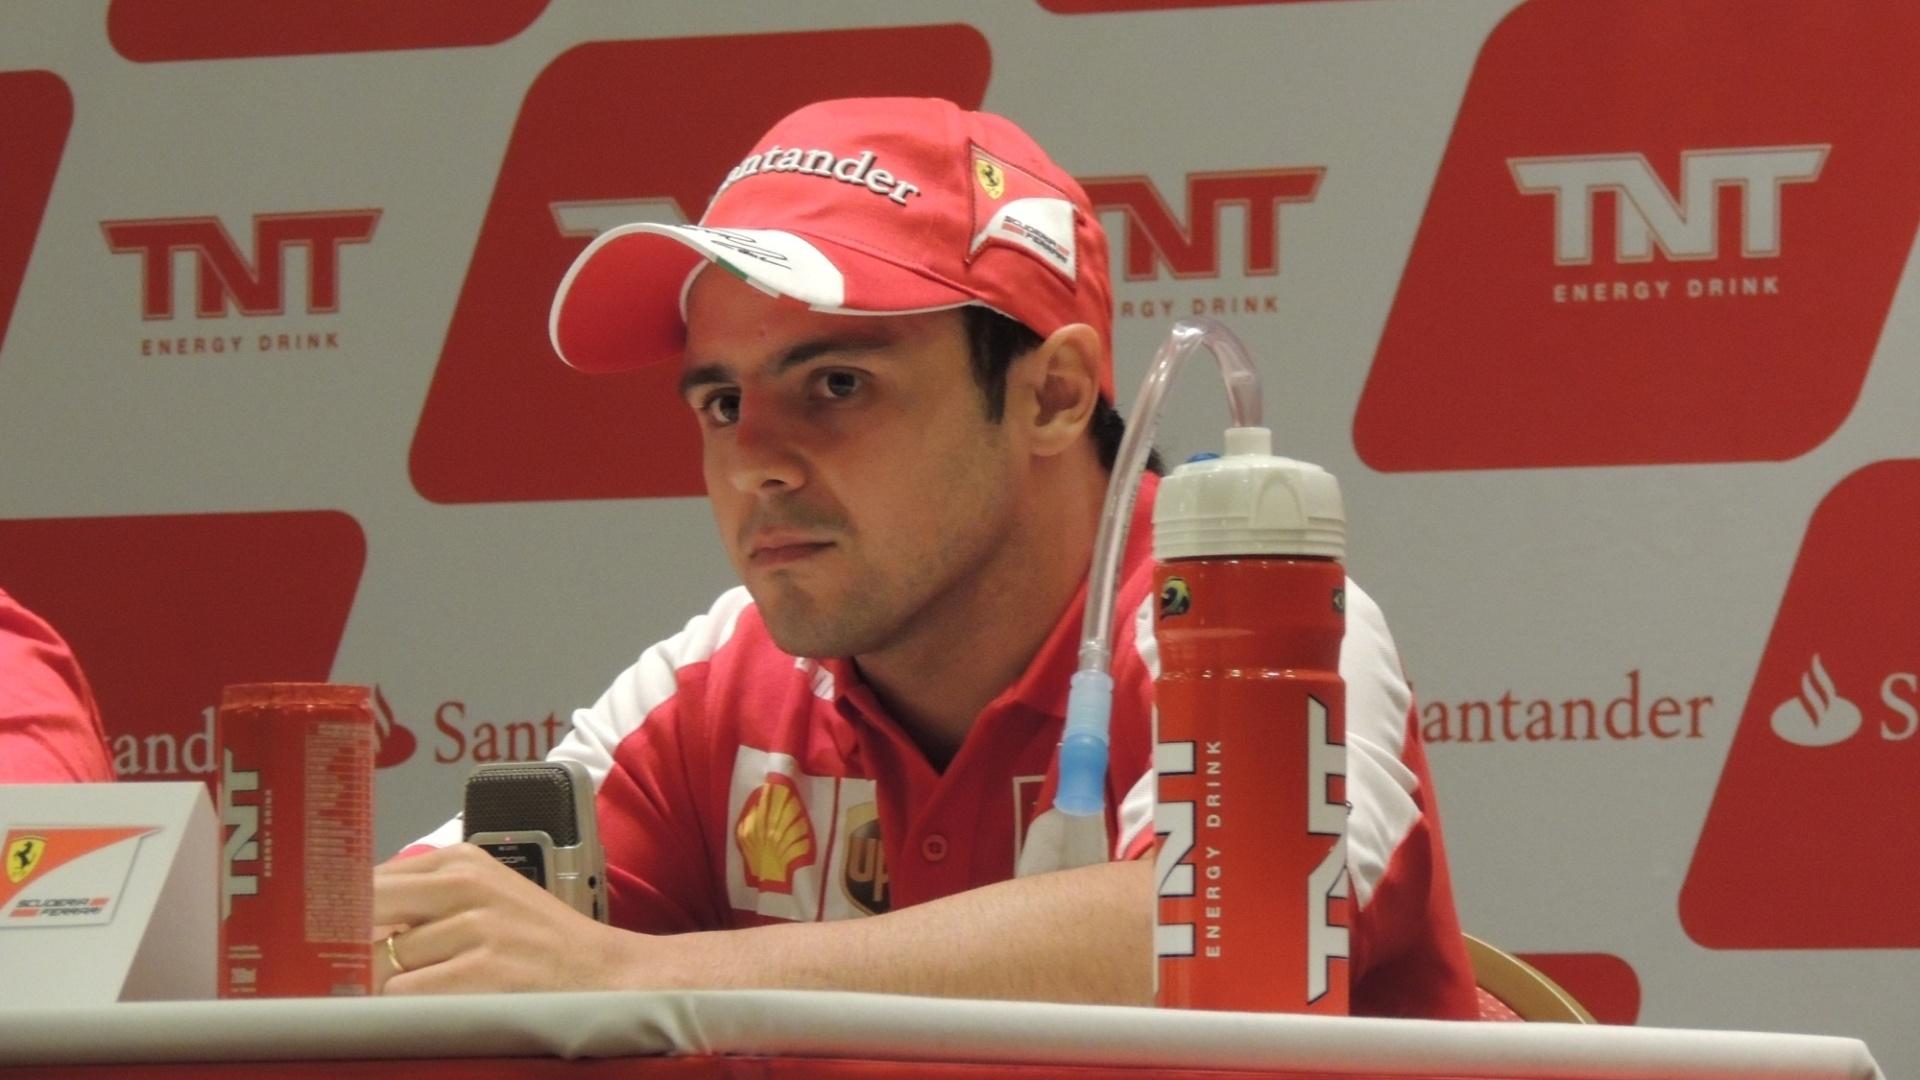 Felipe Massa, piloto da Ferrari, fala durante entrevista coletiva, neste sábado